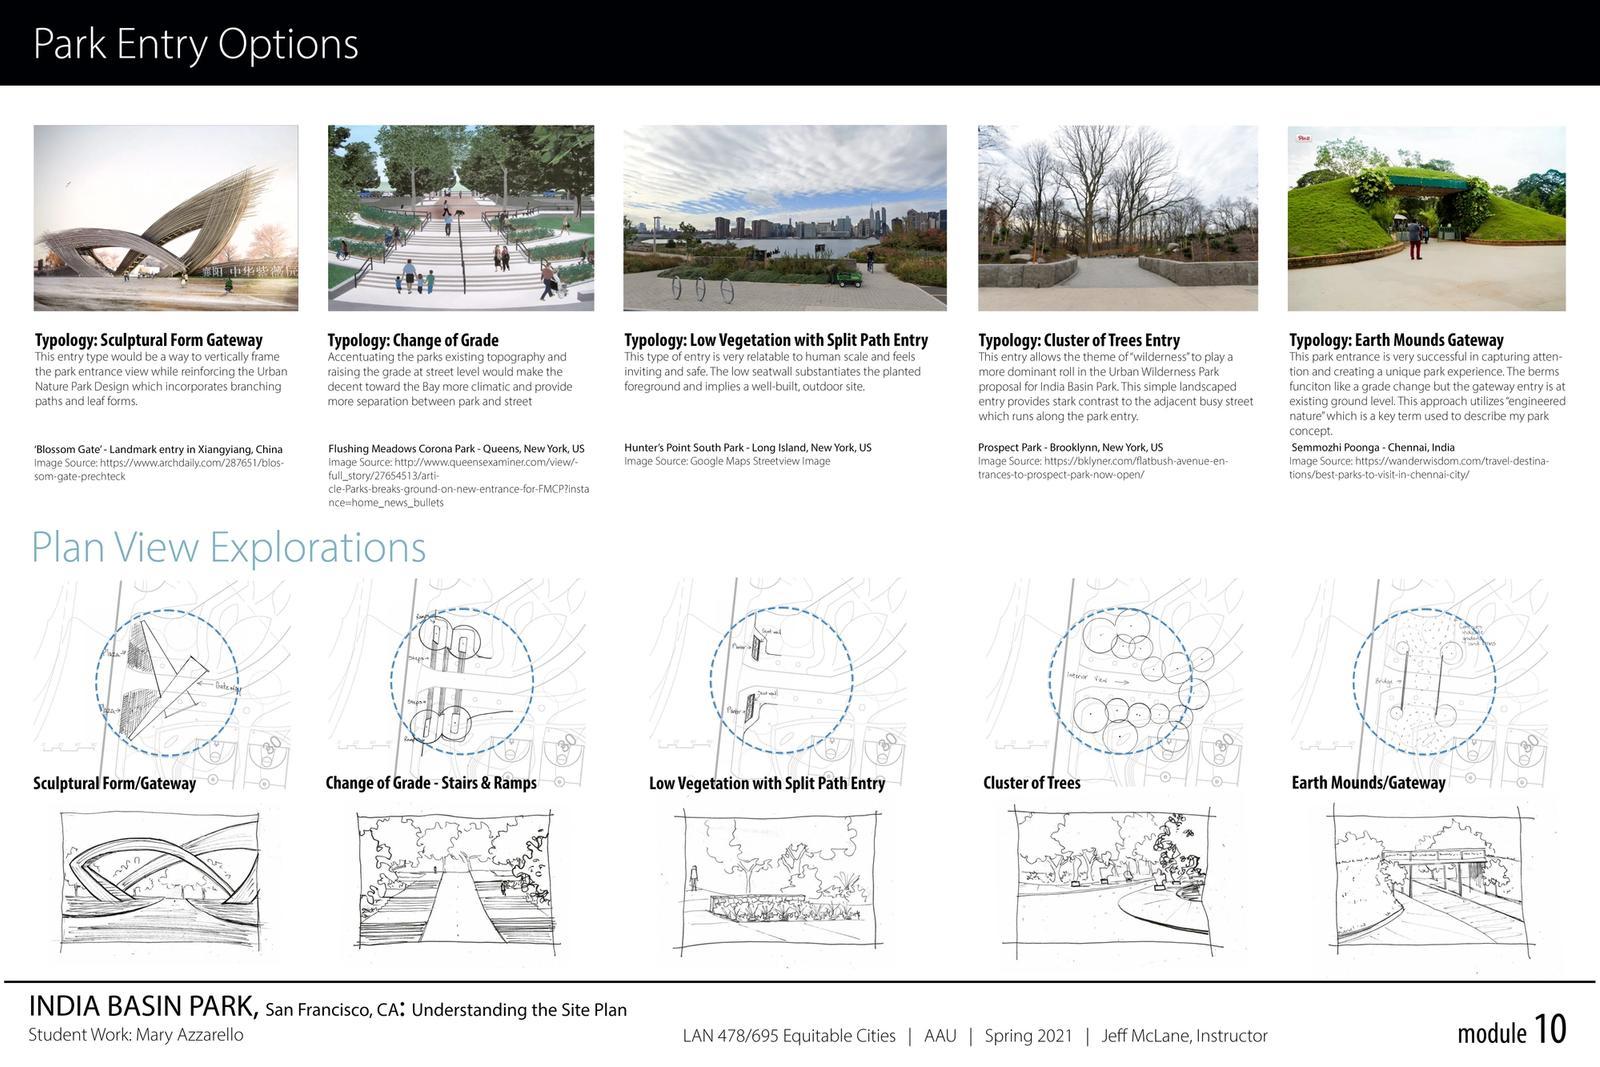 India Basin Park, San Francisco - Park Entry Options